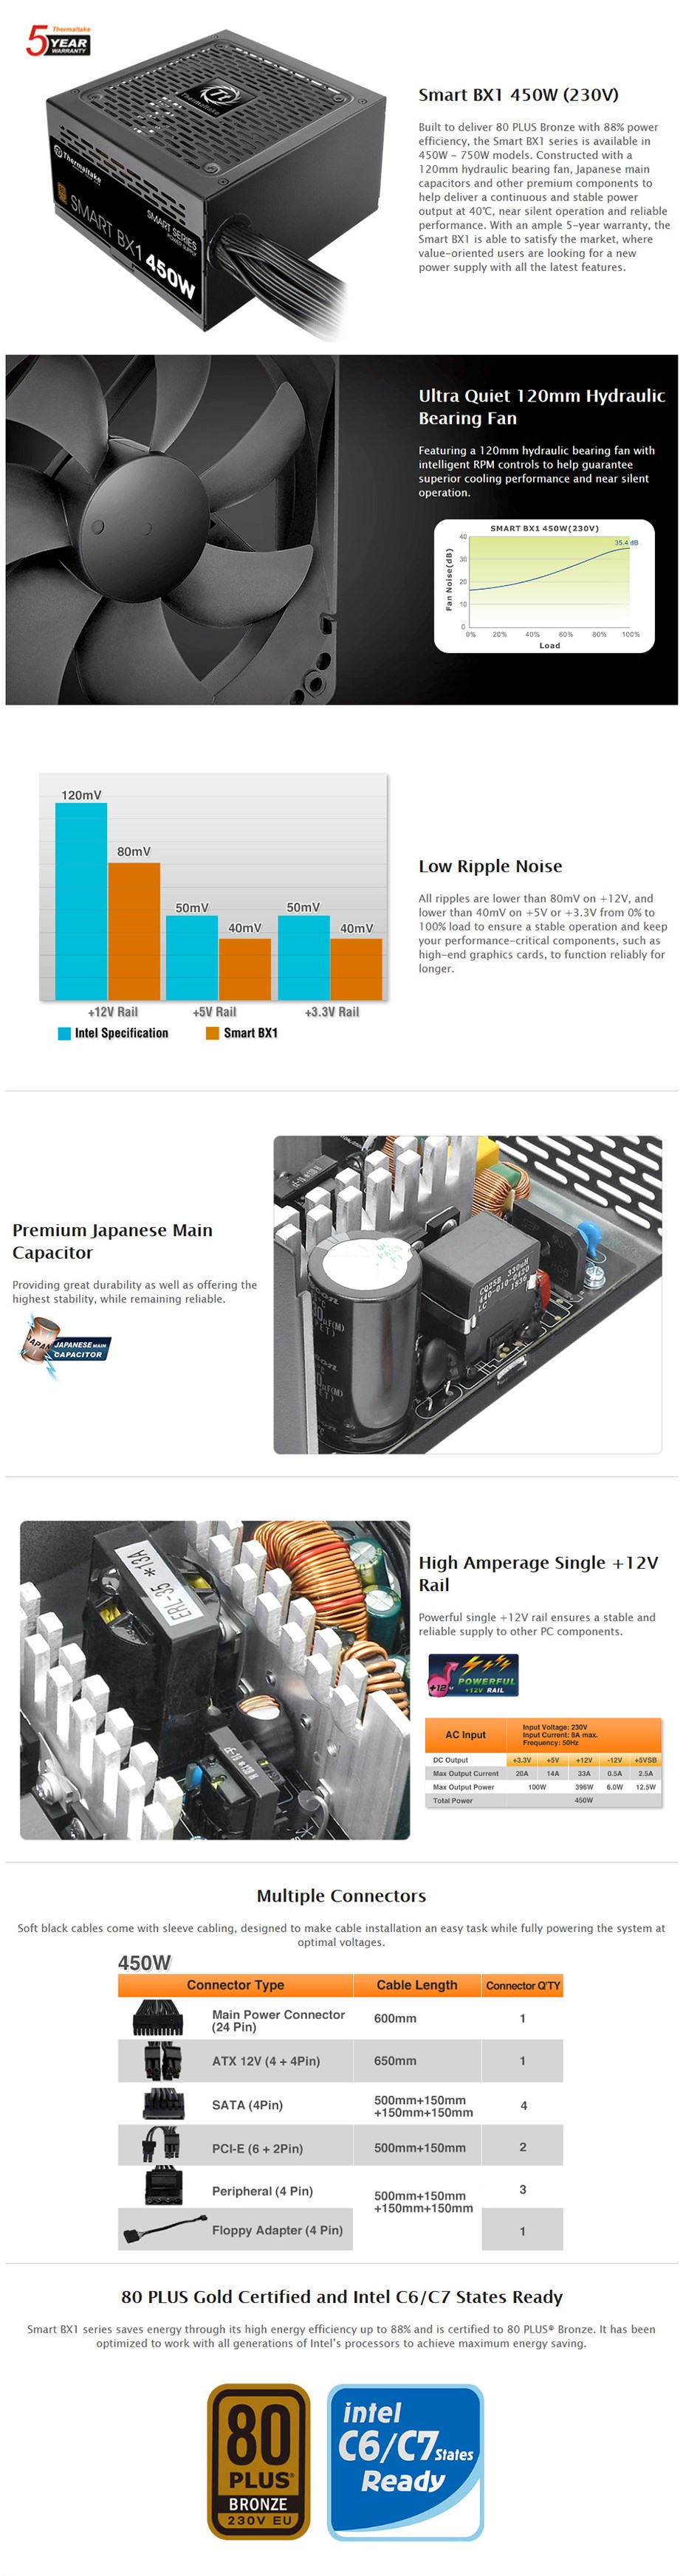 Thermaltake Smart BX1 230V 450W 80+ Bronze Non Modular Power Supply - Desktop Overview 1